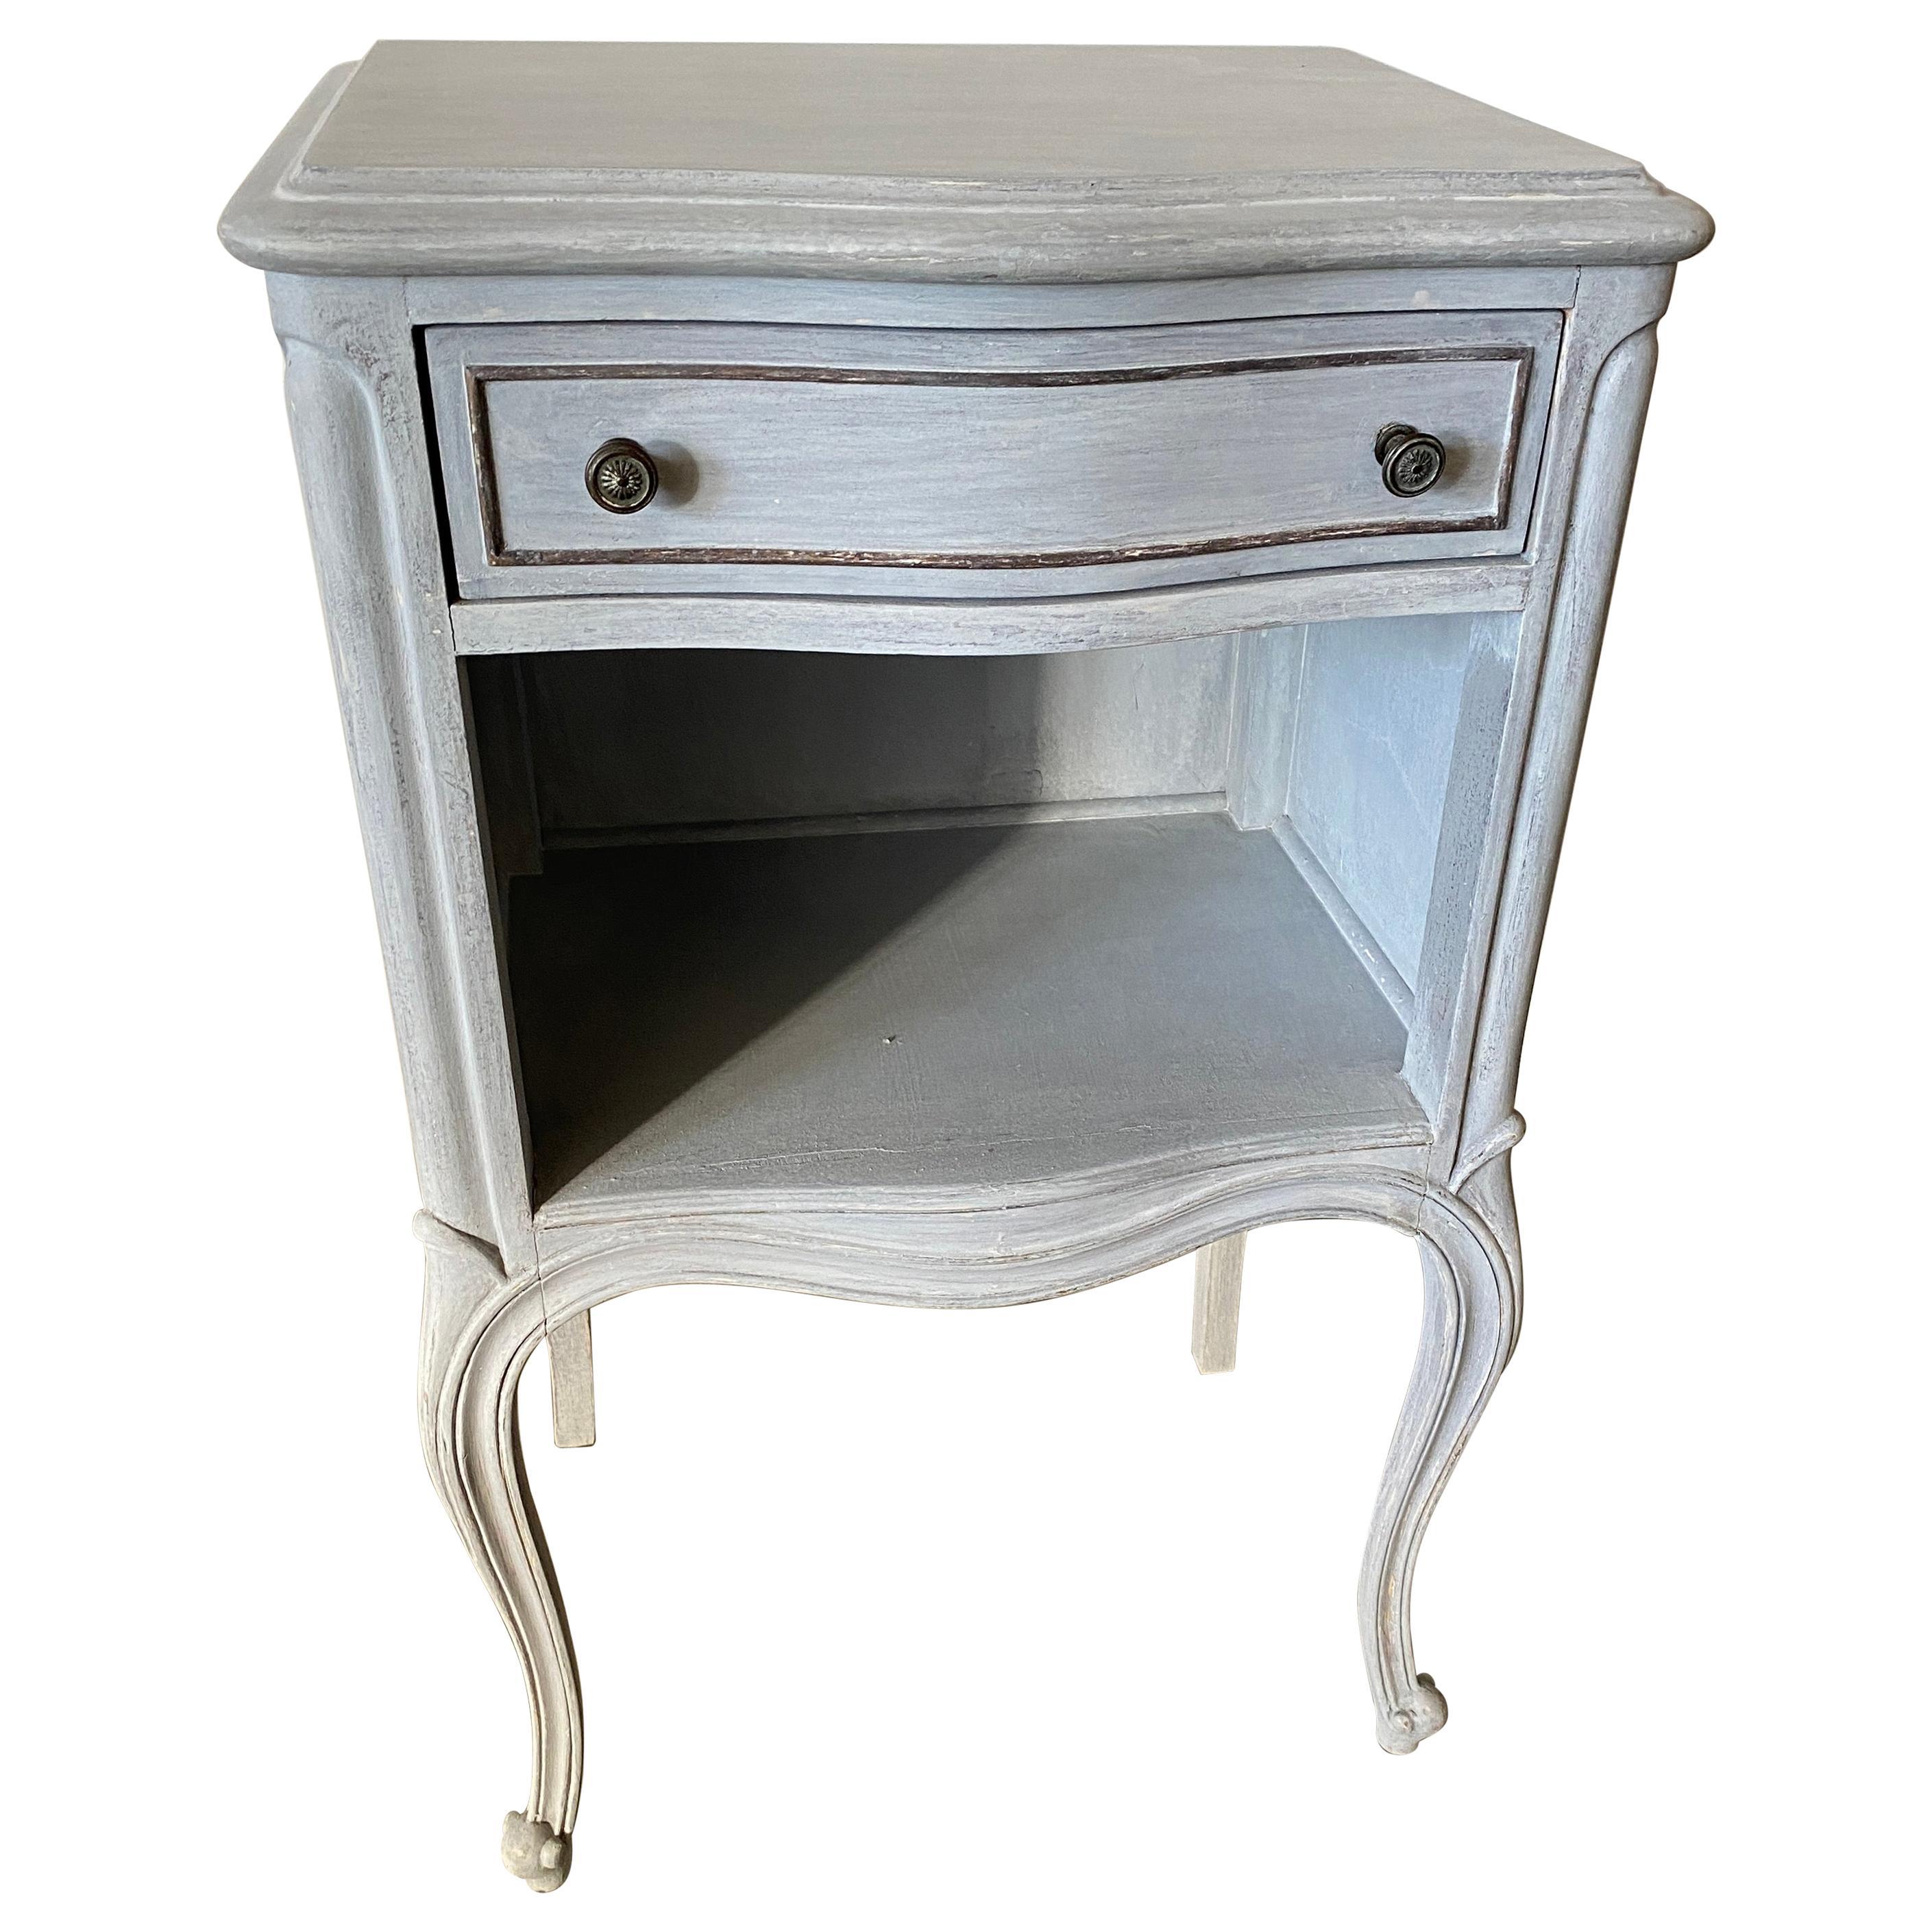 Painted Louis XVI Style Nightstand